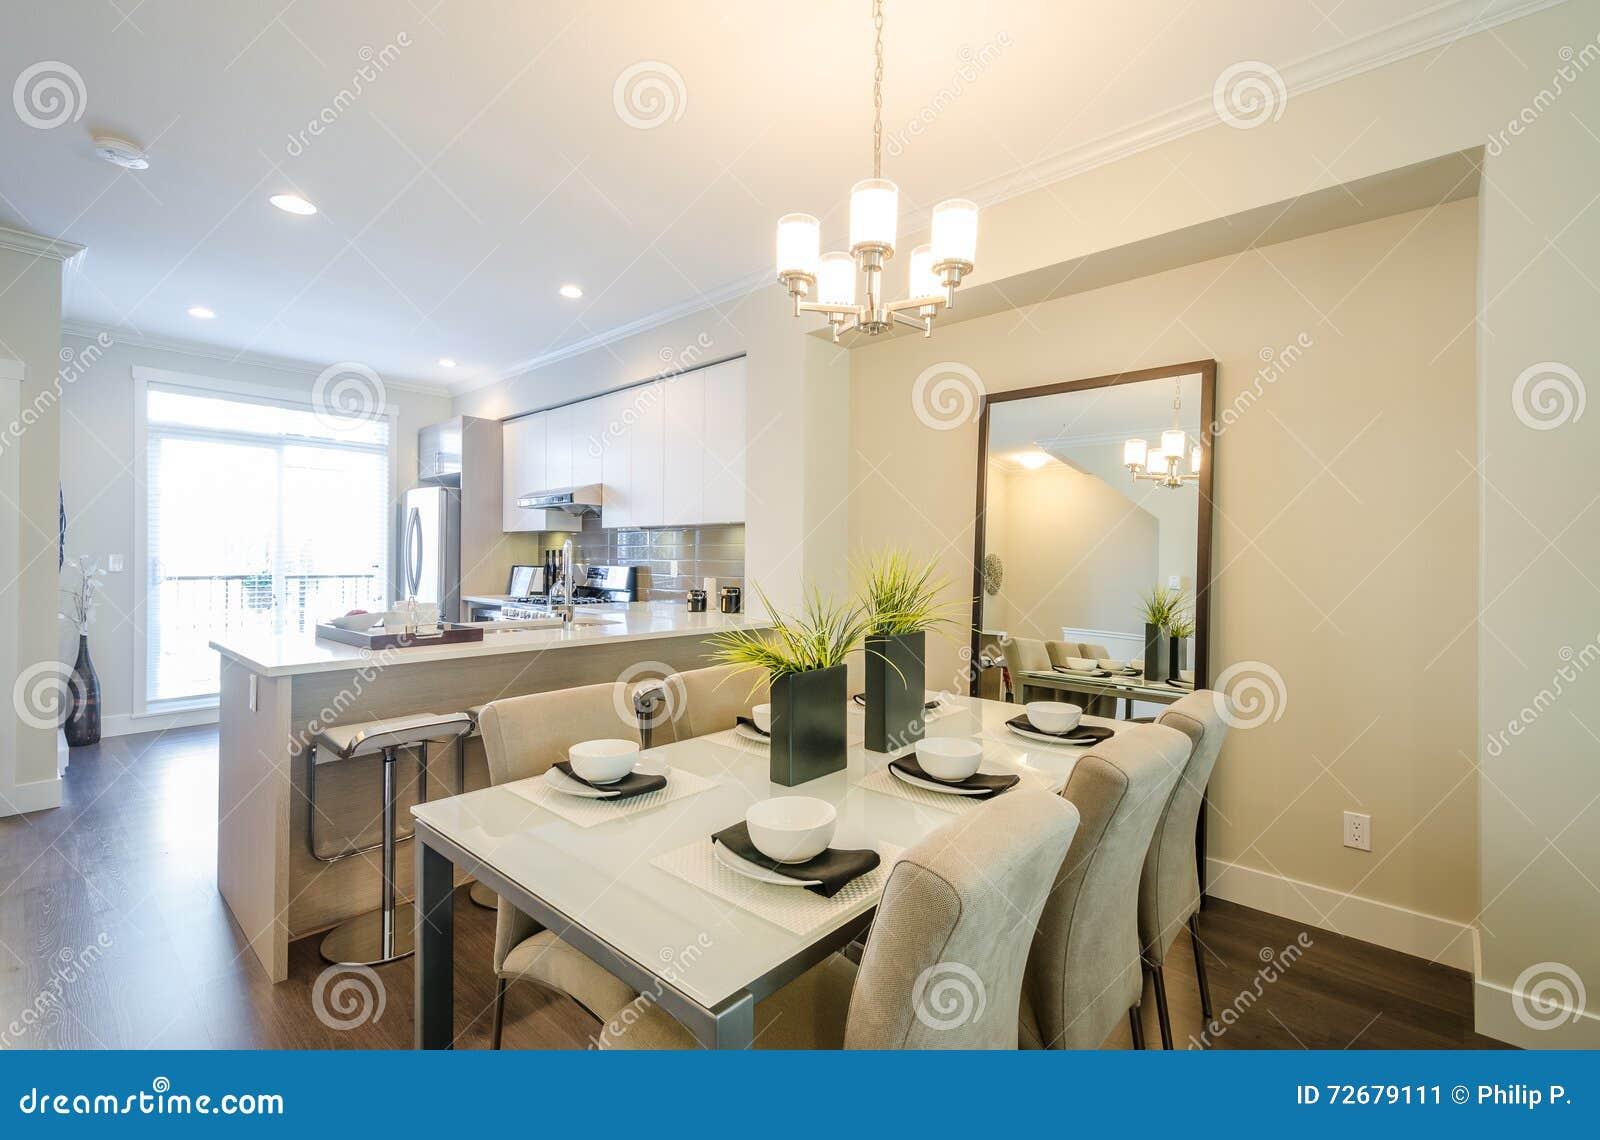 Moderne eetkamer en keuken stock foto afbeelding 72679111 - Eigentijds eetkamer model ...